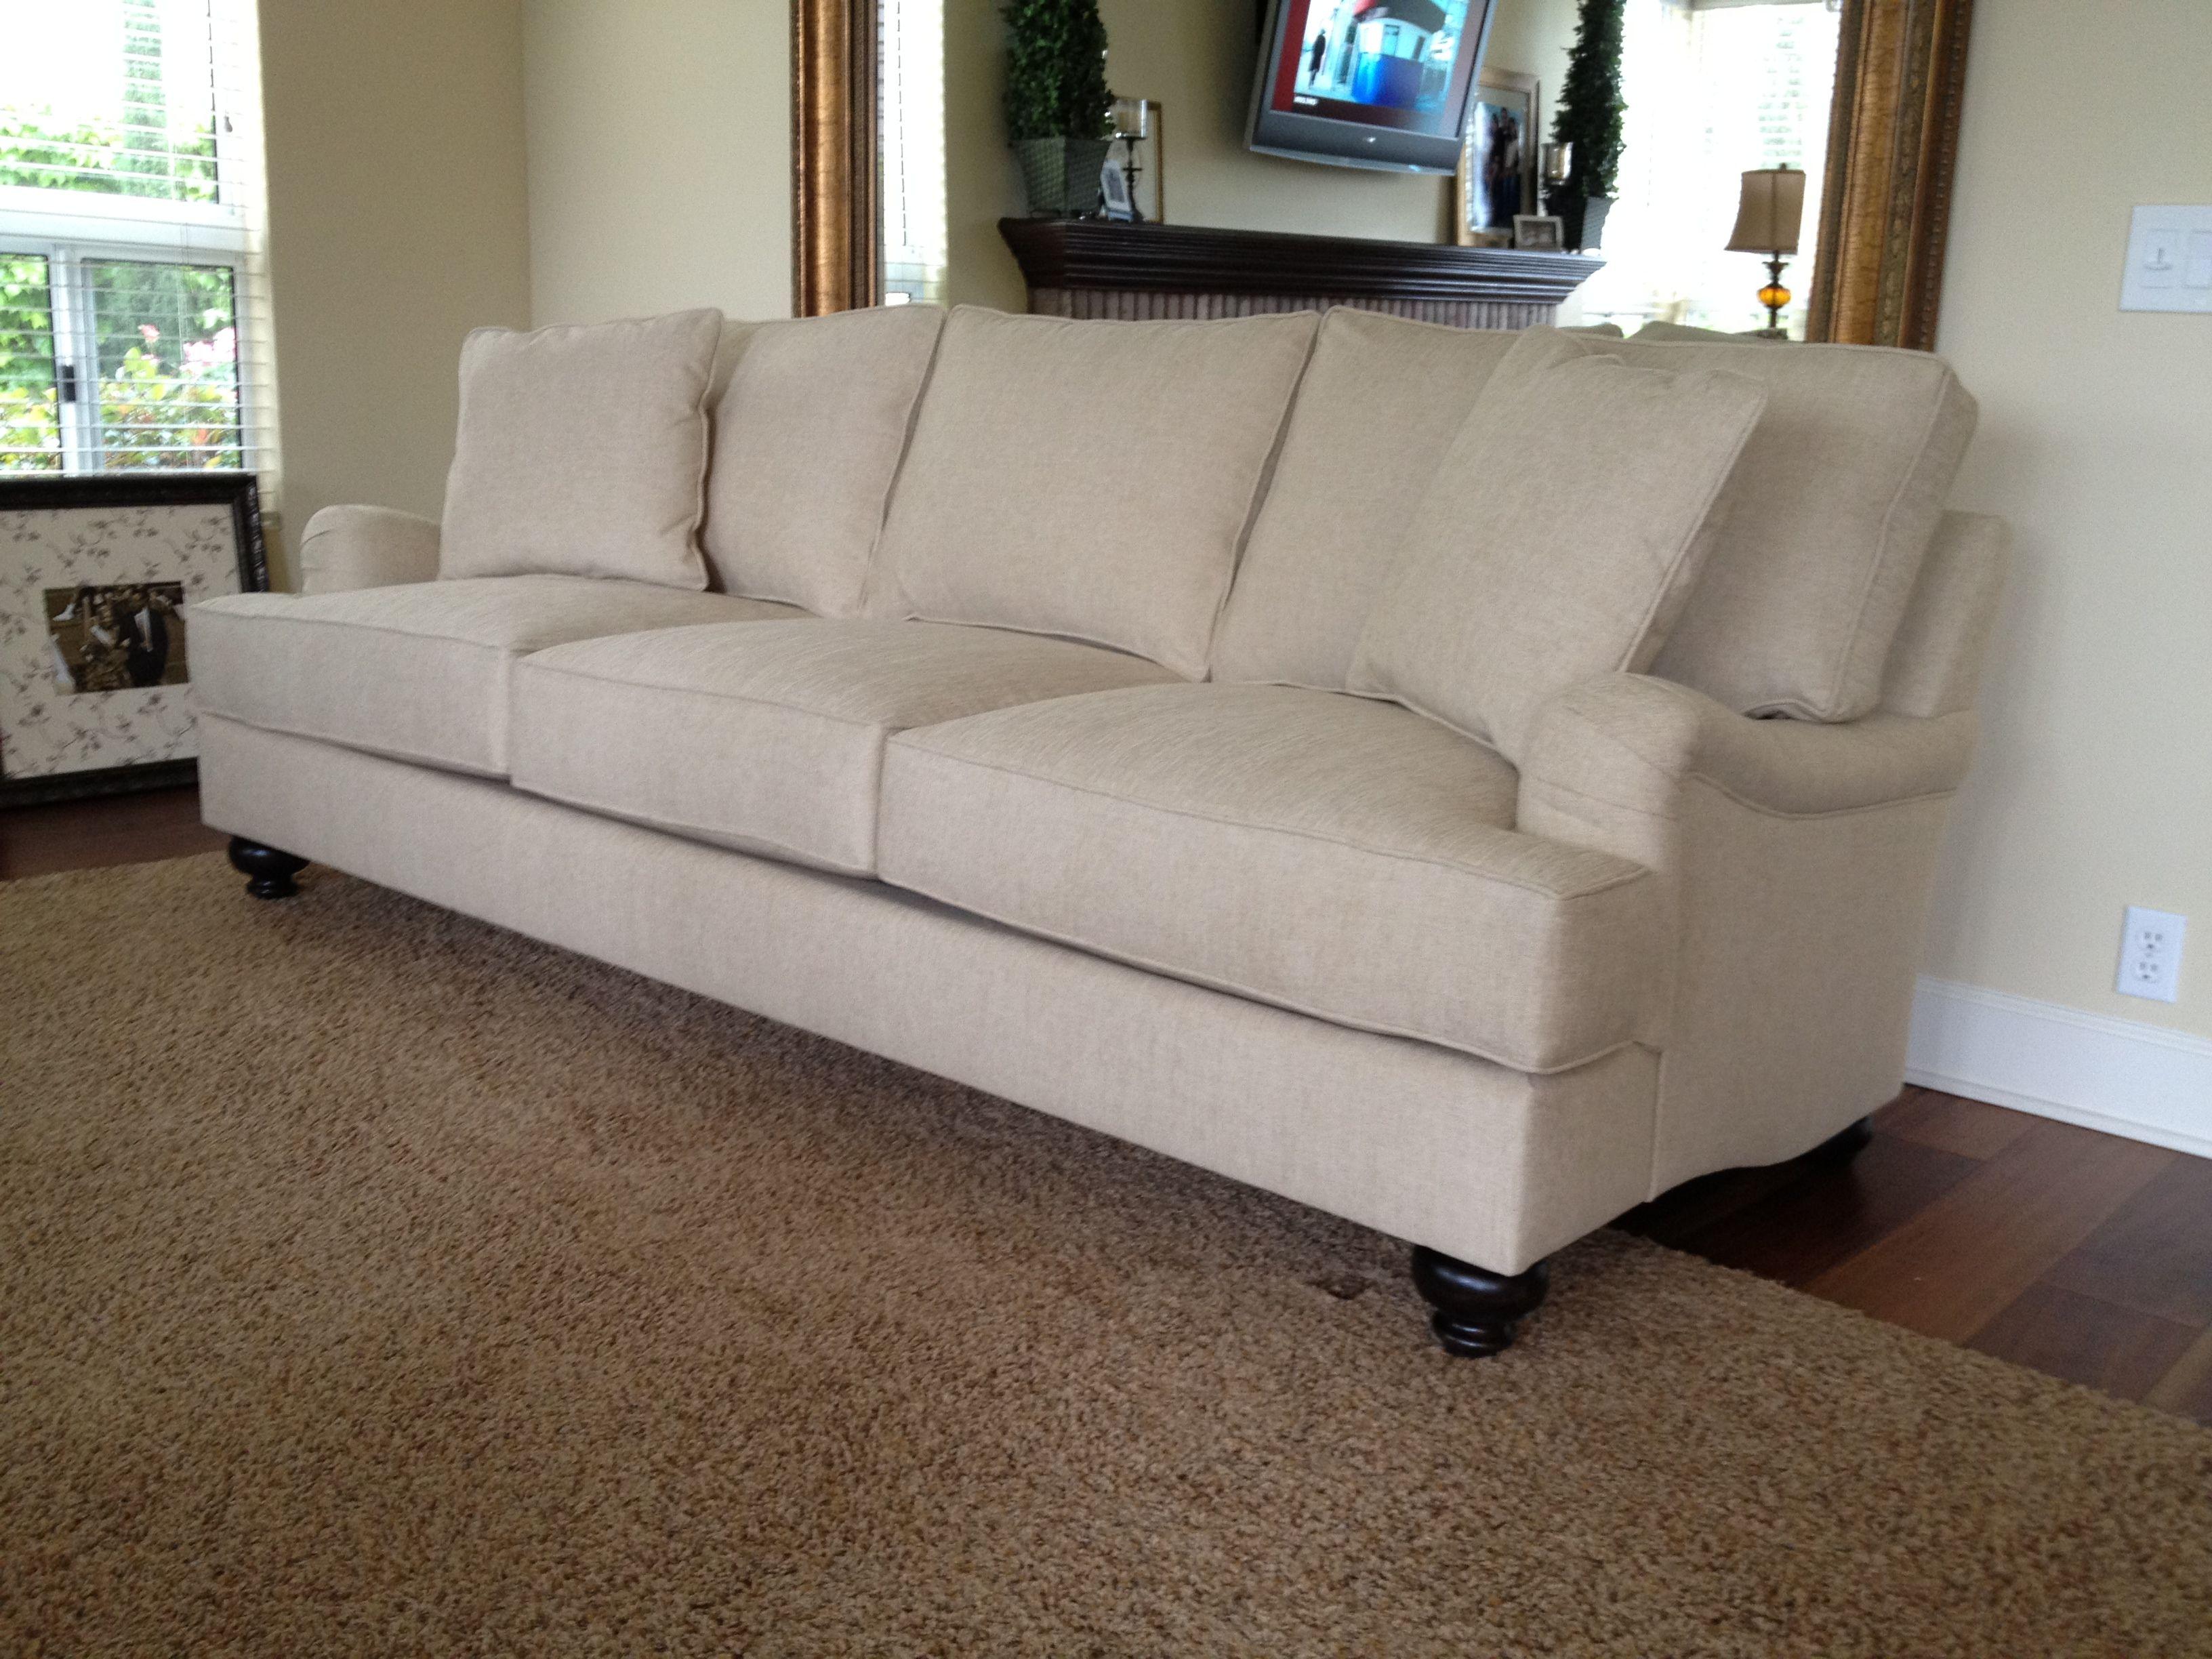 Houzz Sofas Sofa Sleepers With Storage Gradschoolfairs